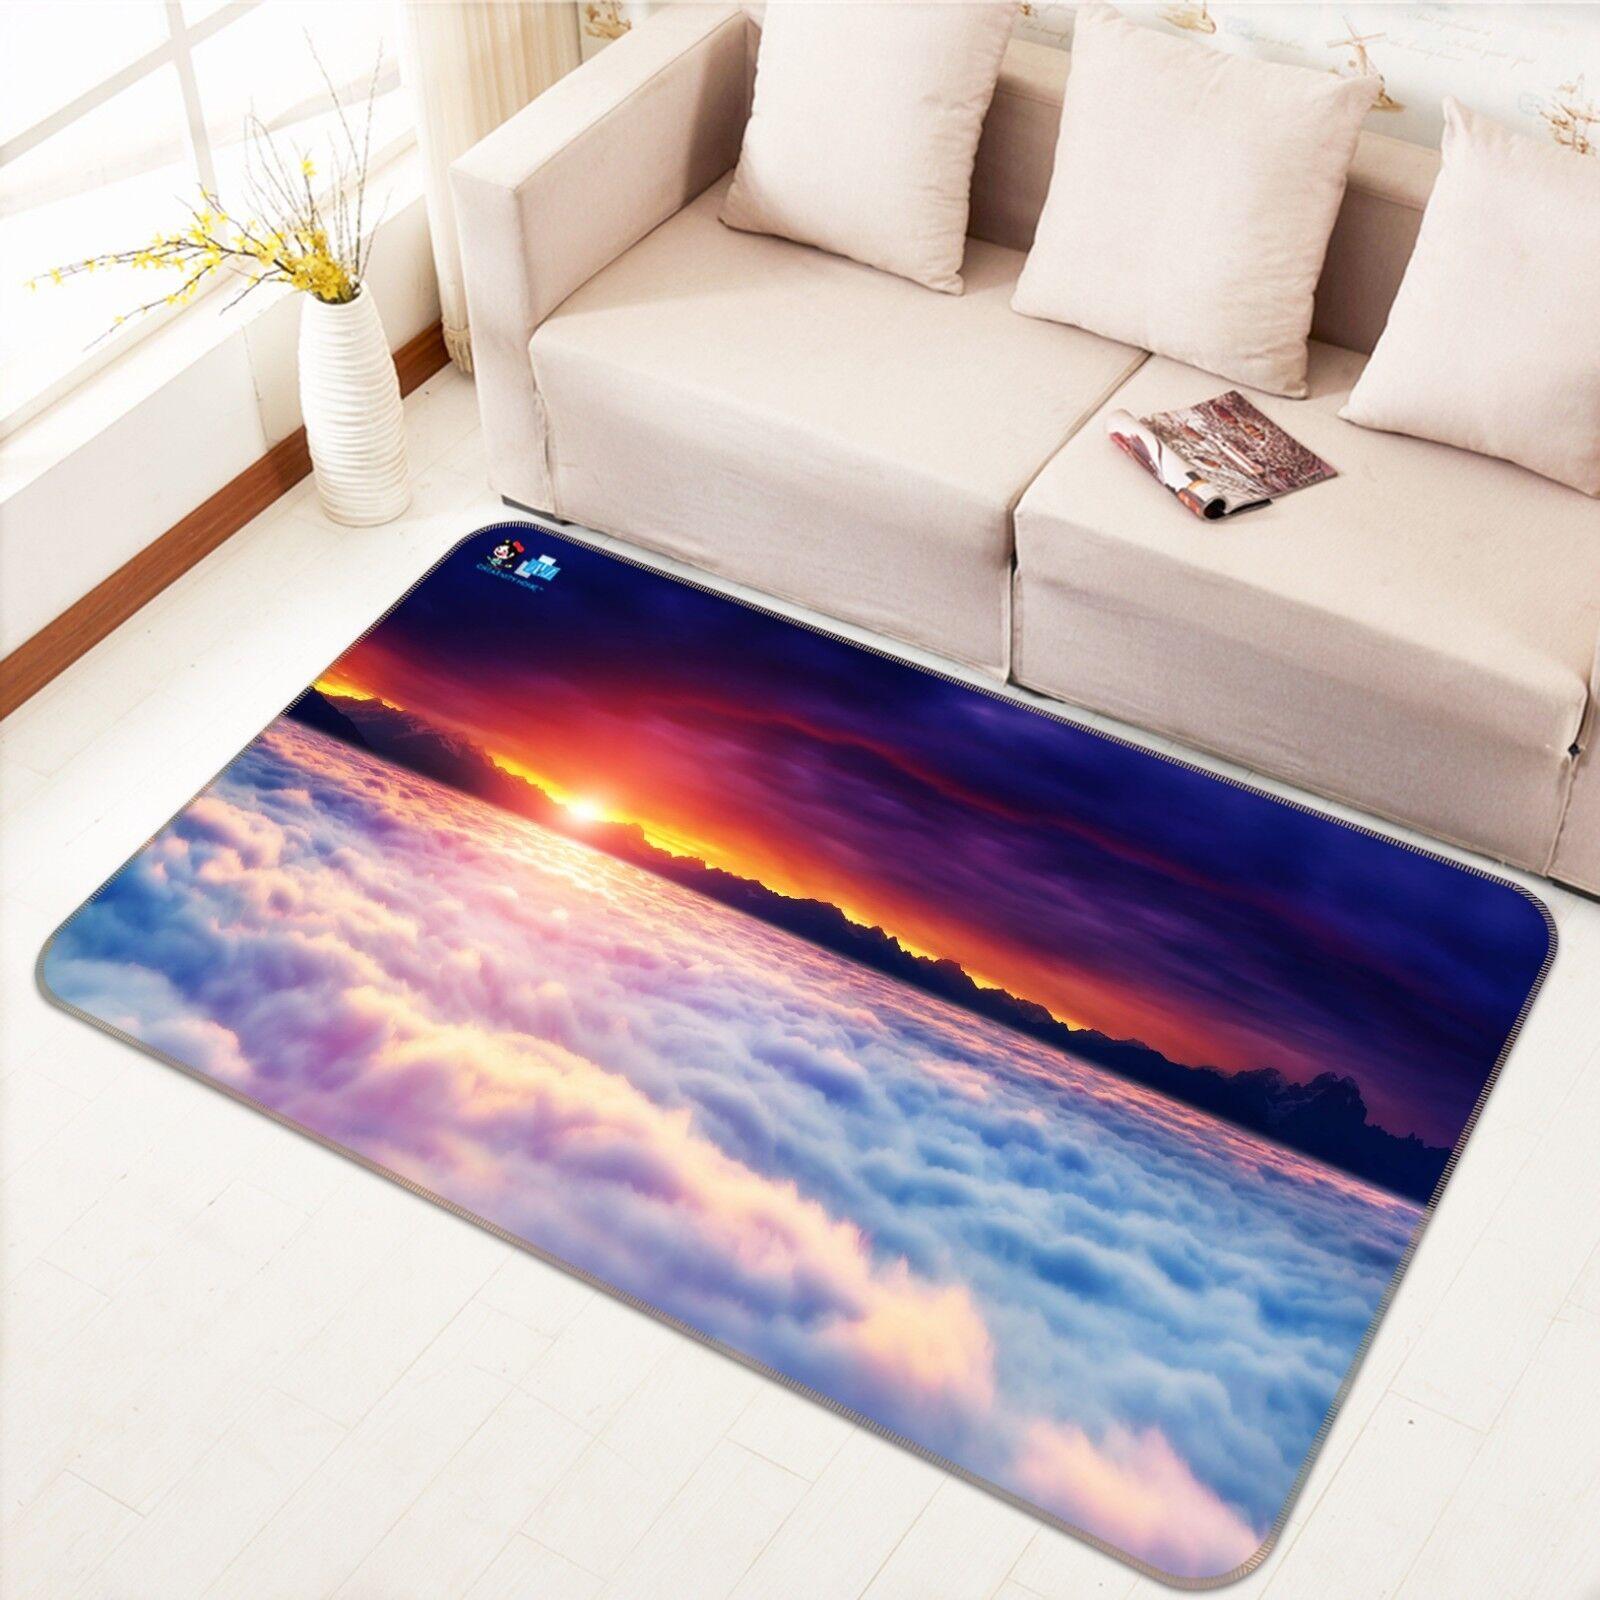 3D fotografia Cloud 5 tappetino antiscivolo tappeto camera Tappetino Qualità Elegante foto Tappeto UK